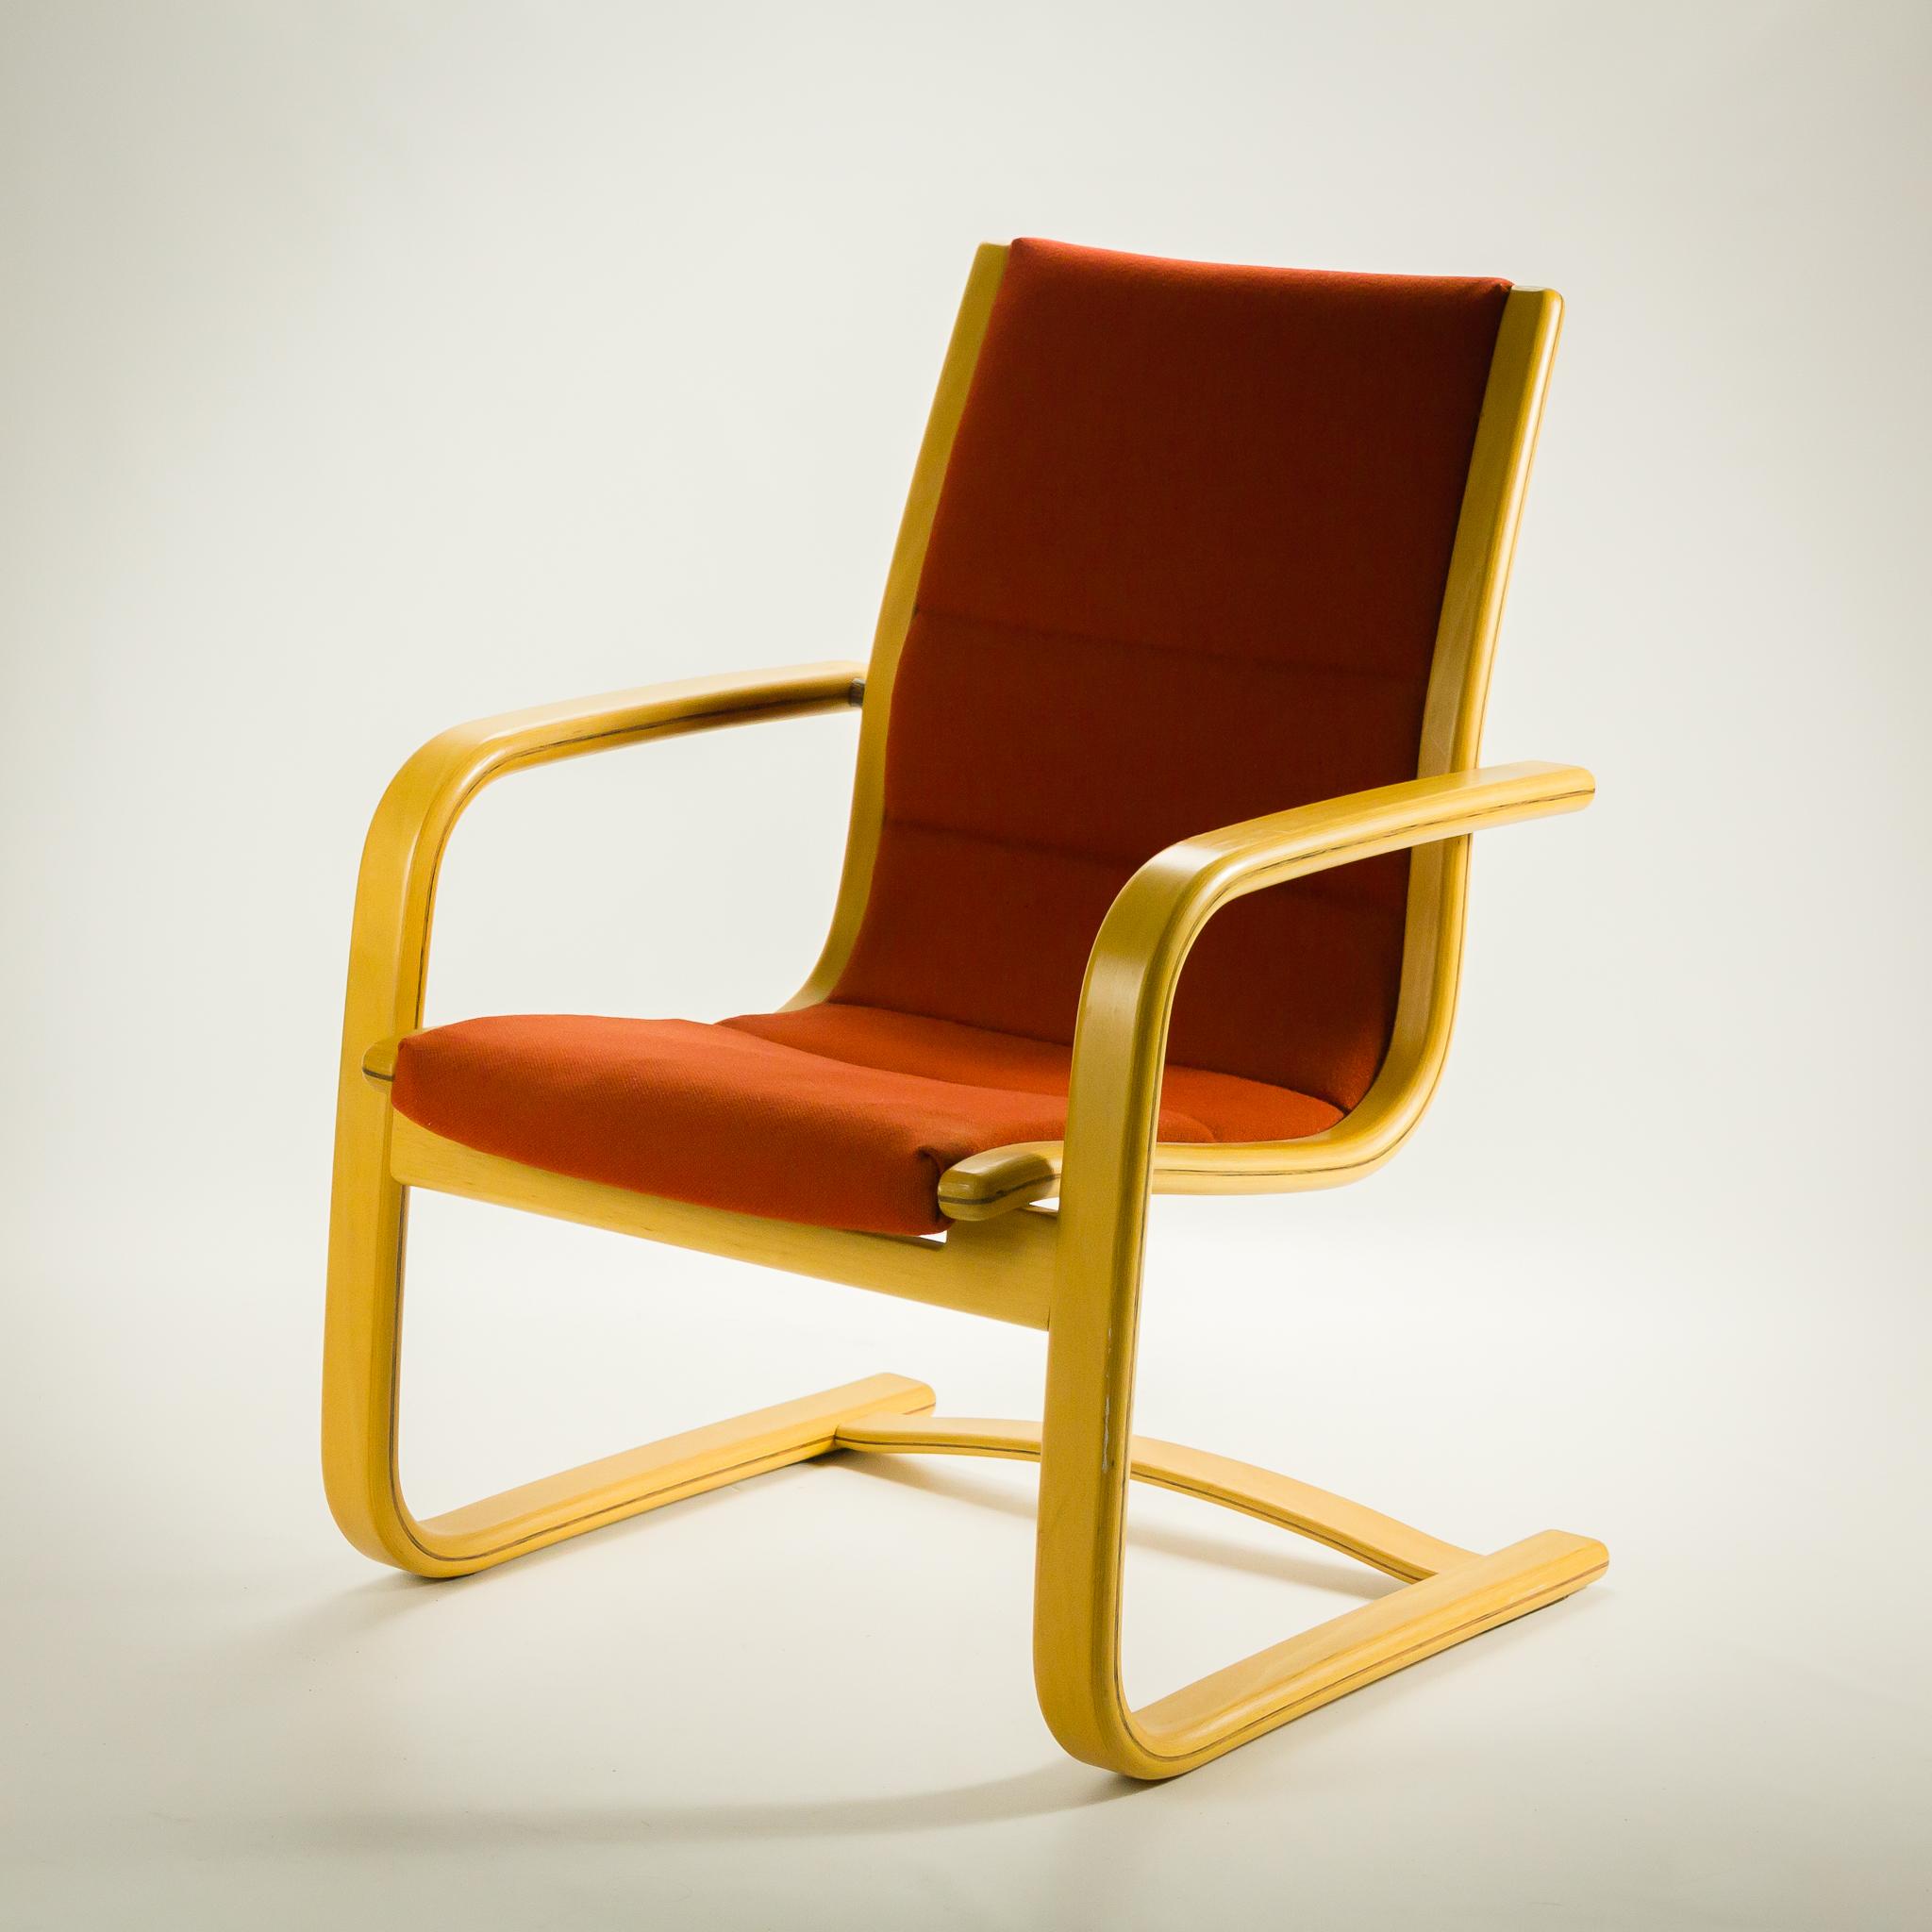 80 u2019s Swedese Lamello fauteuil lage rug Yngve Ekstrom BarbMama